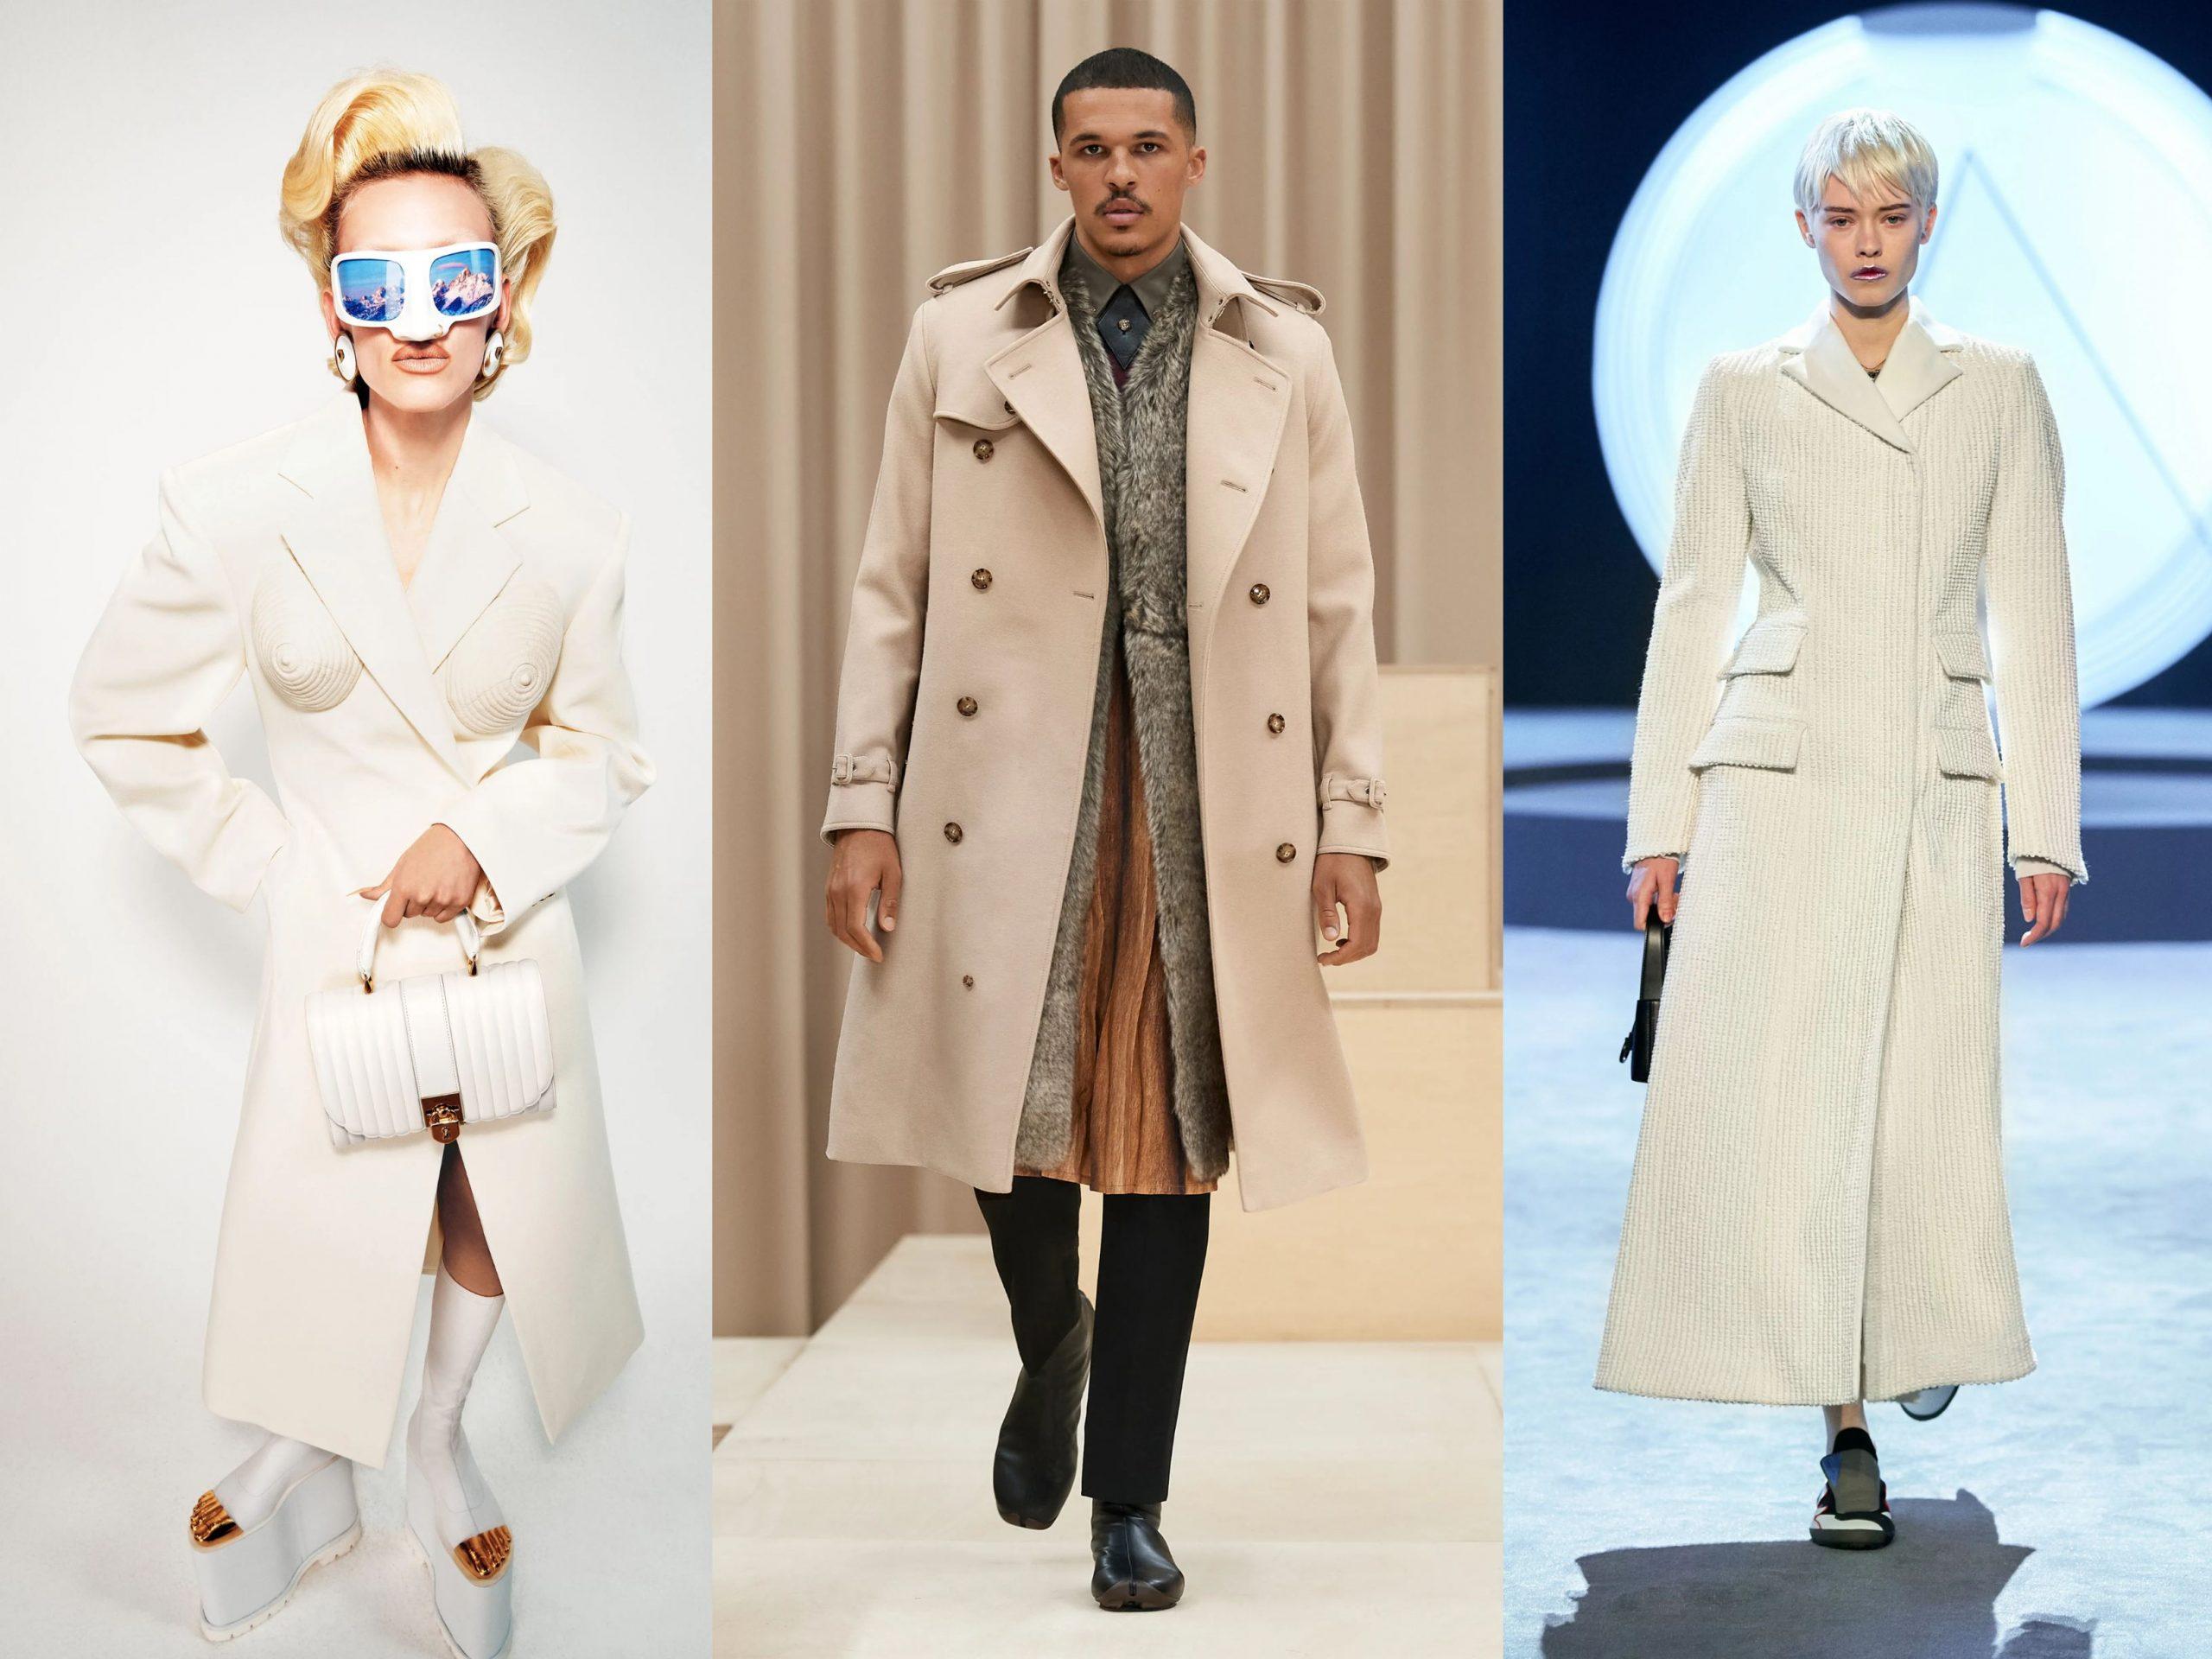 Models wearing AW21 Trends long coats